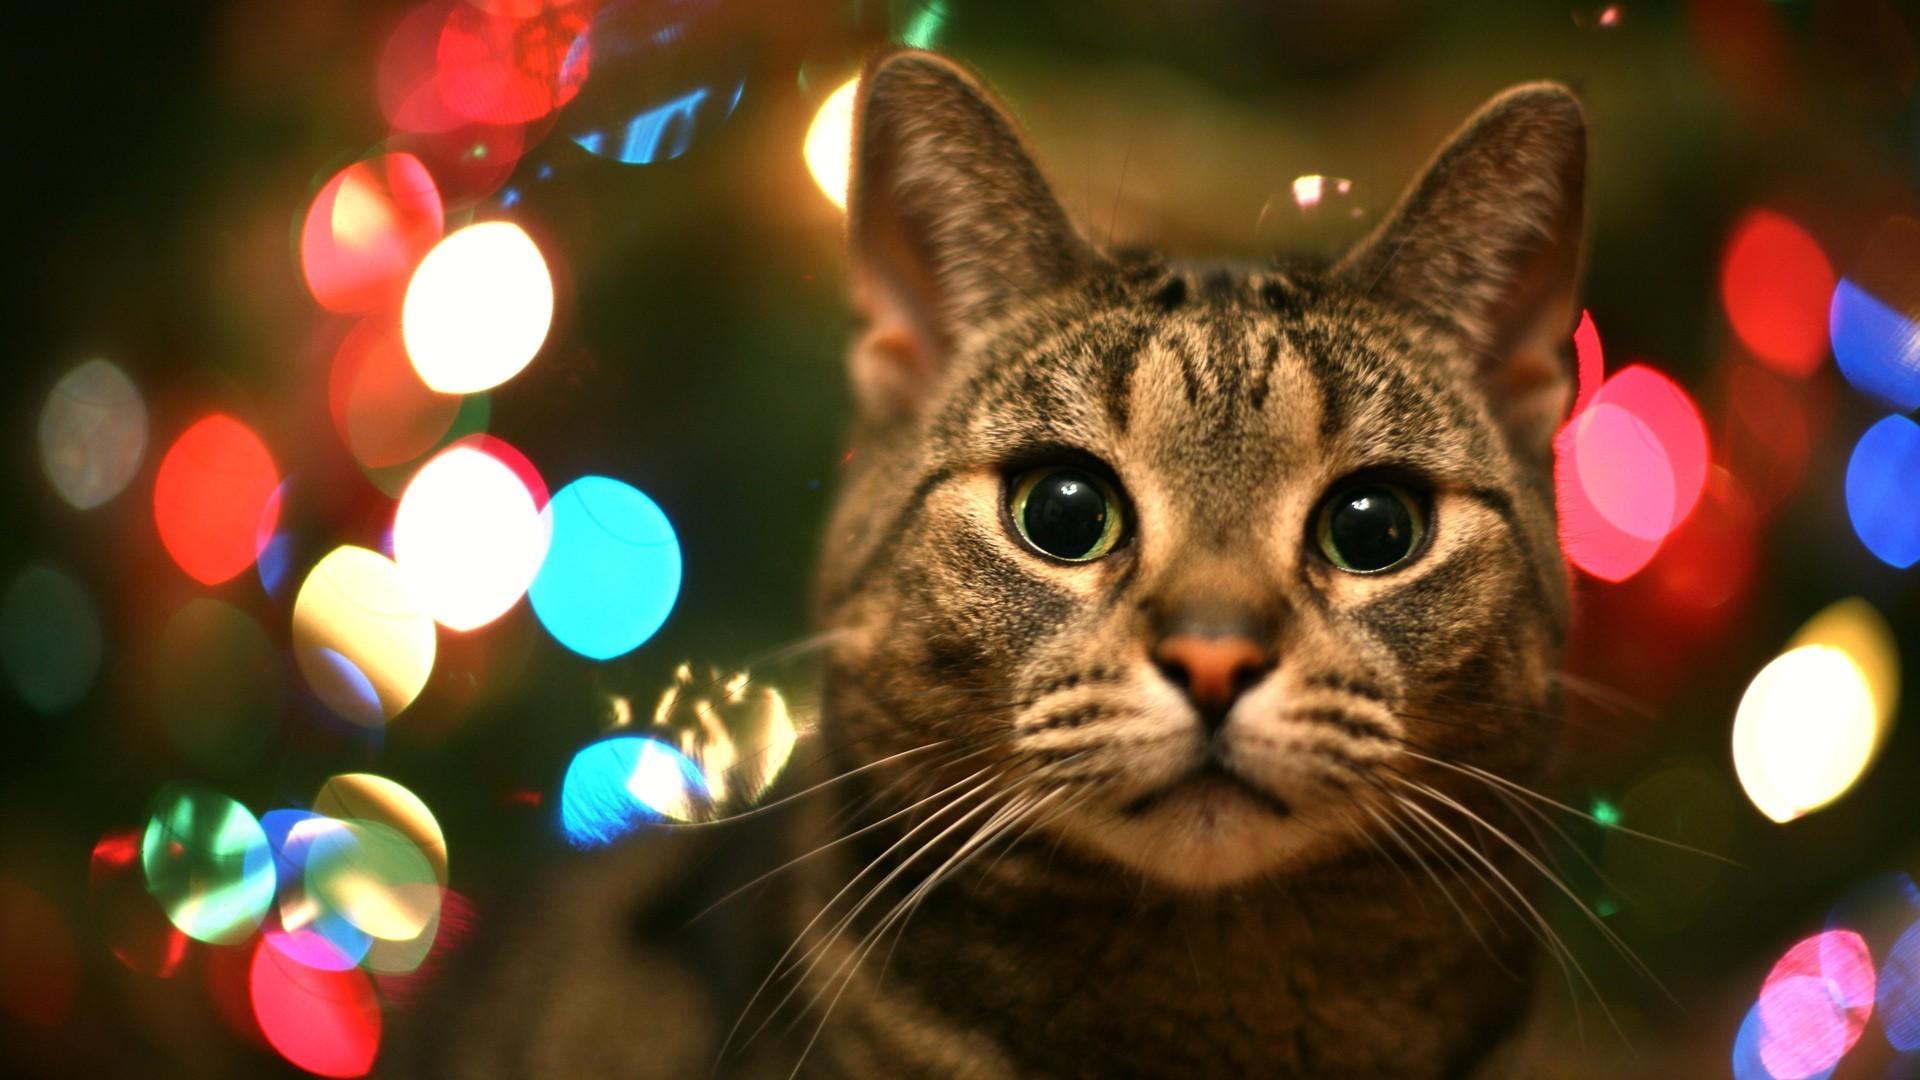 Cat In Christmas Lights | High Quality Wallpapers,Wallpaper Desktop .